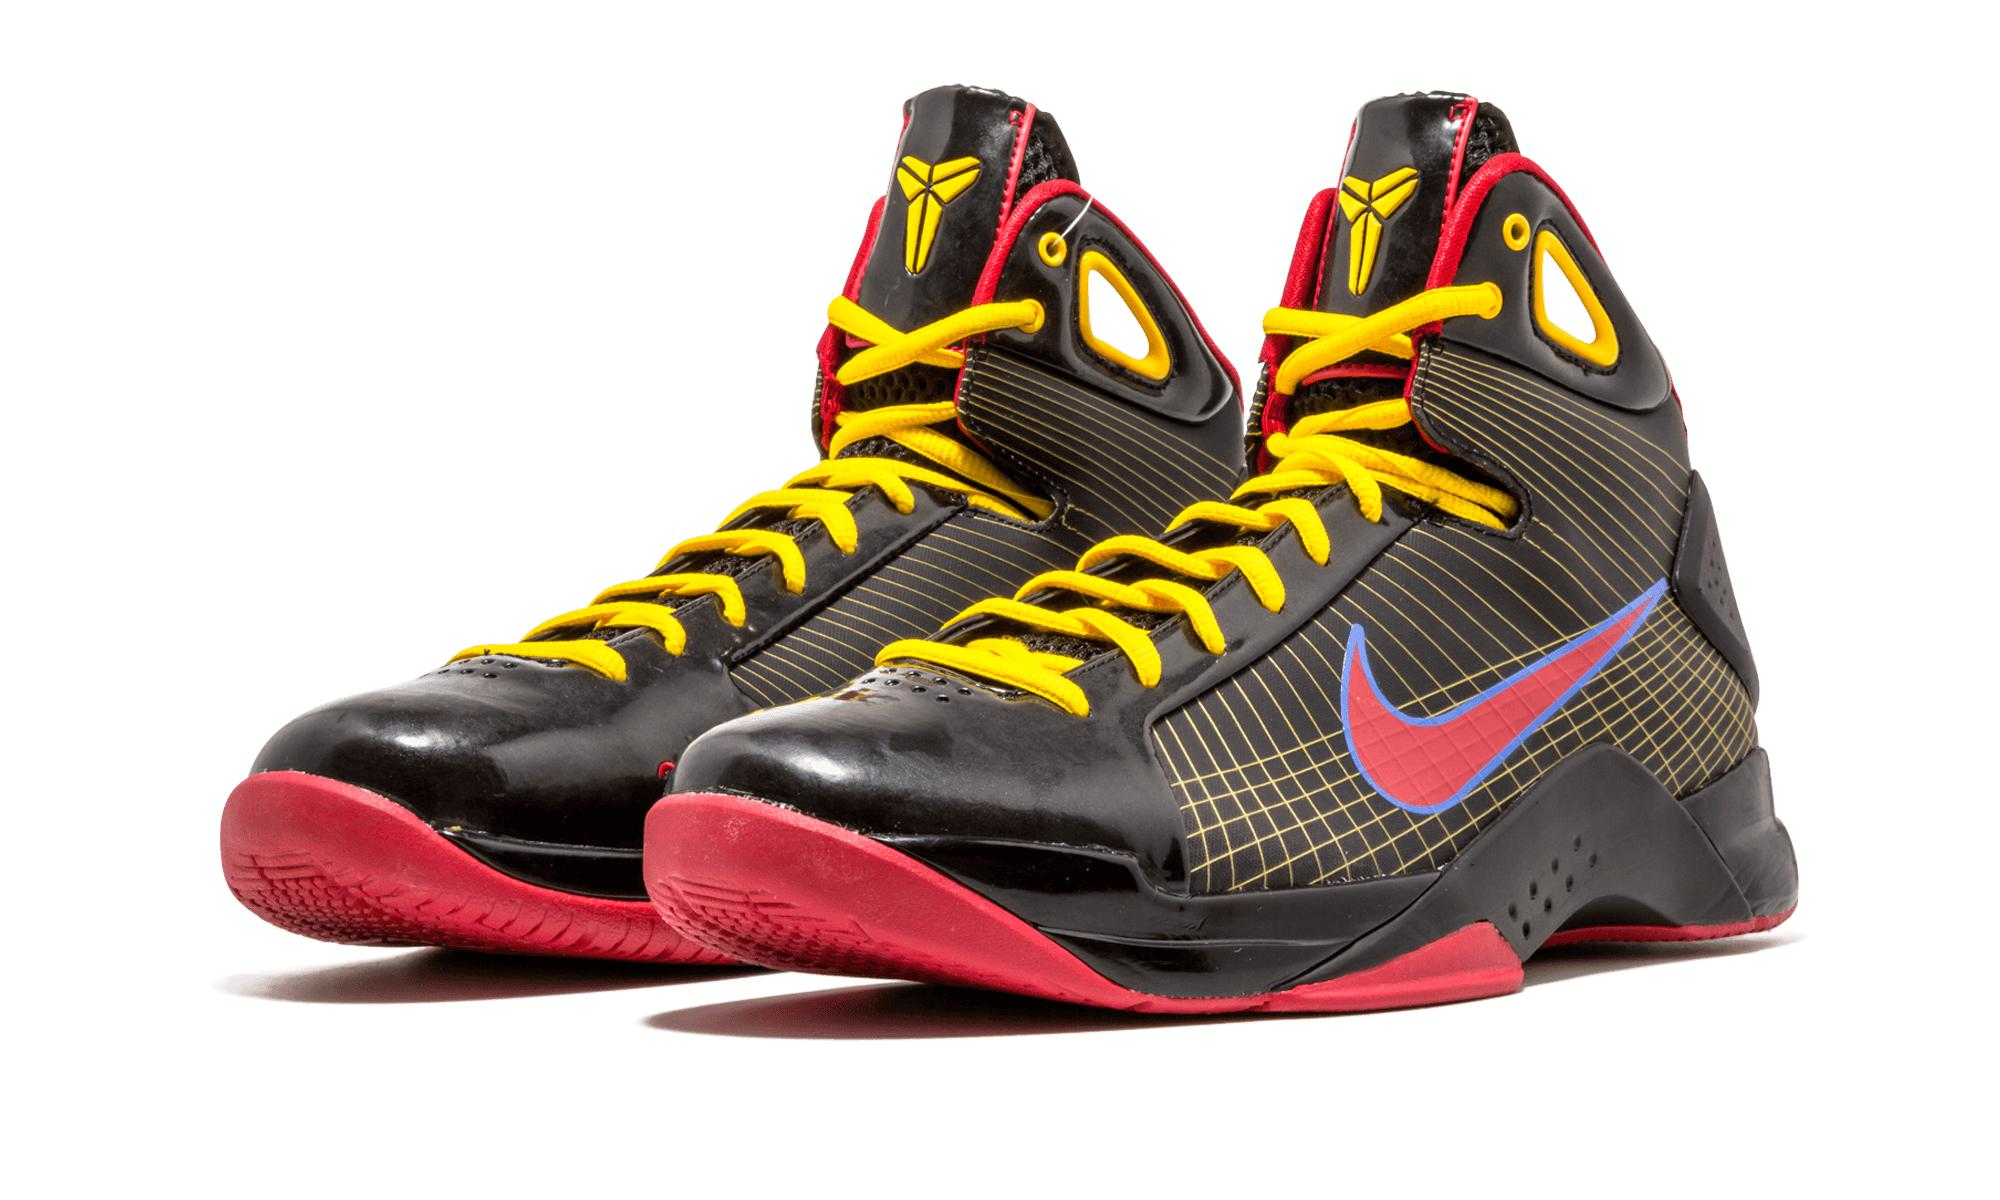 fe43a2b99038 Lyst - Nike Hyperdunk Supreme in Black for Men